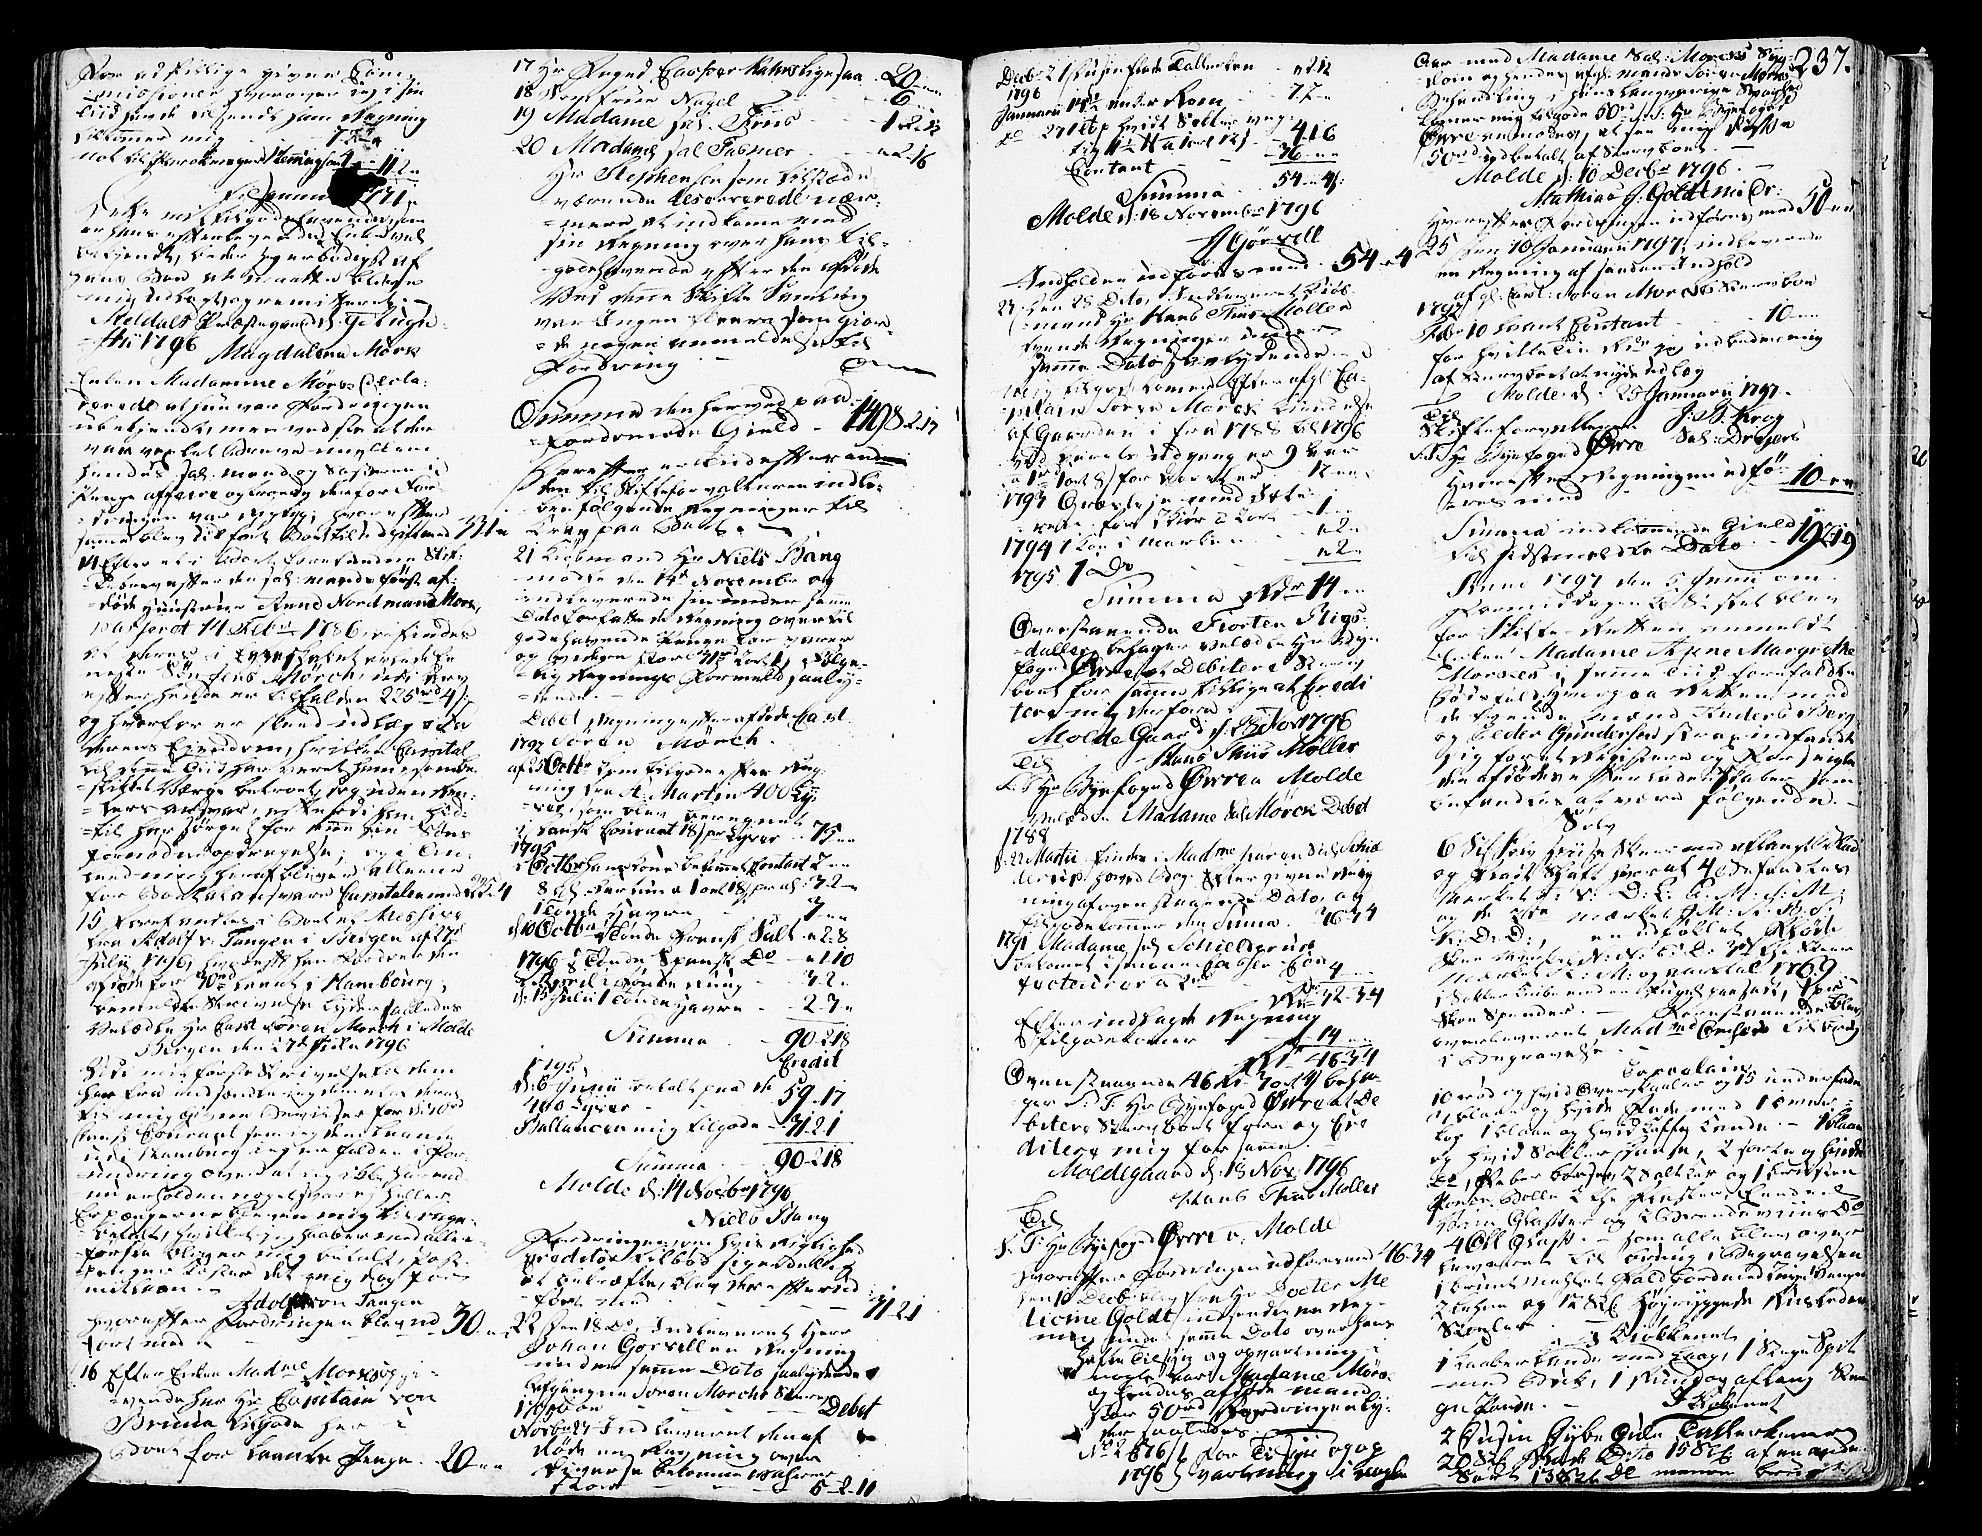 SAT, Molde byfogd, 3Aa/L0003: Skifteprotokoll, 1786-1800, s. 236b-237a